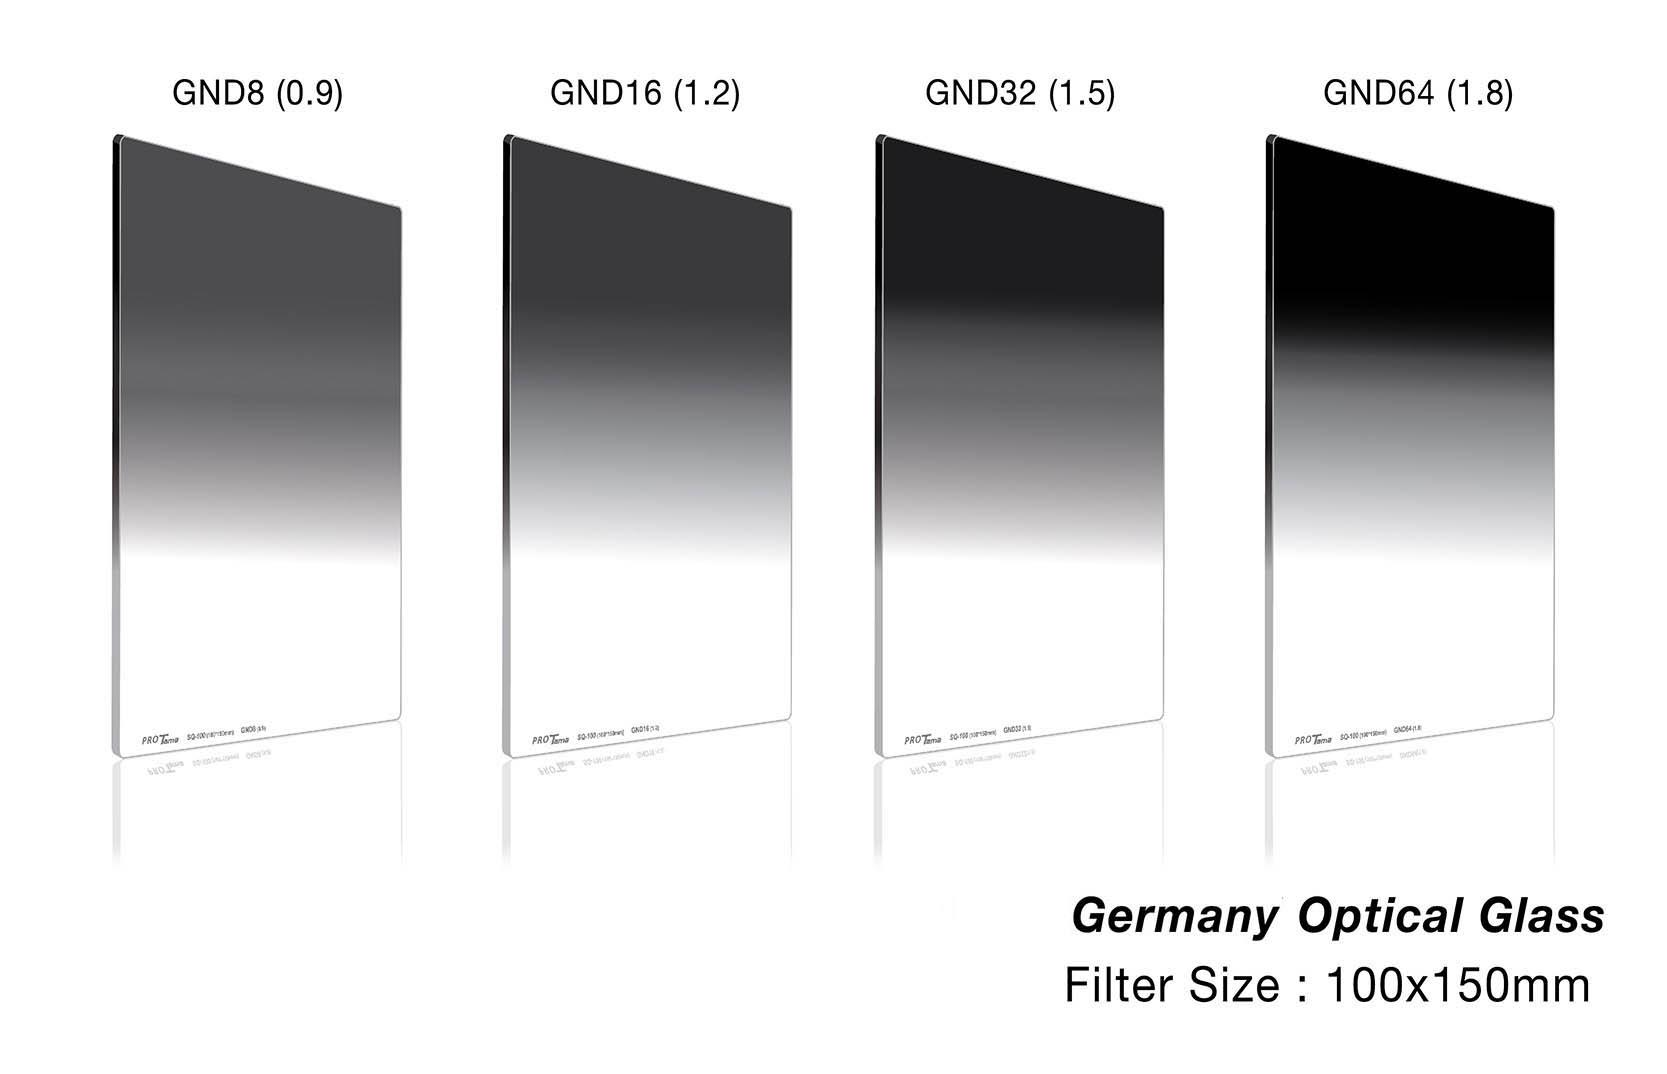 ProTama 天馬 (SQ-100) HD 高清方形濾鏡 100x150 (GND8, GND16, GND32, GND64) - 德國光學玻璃材料